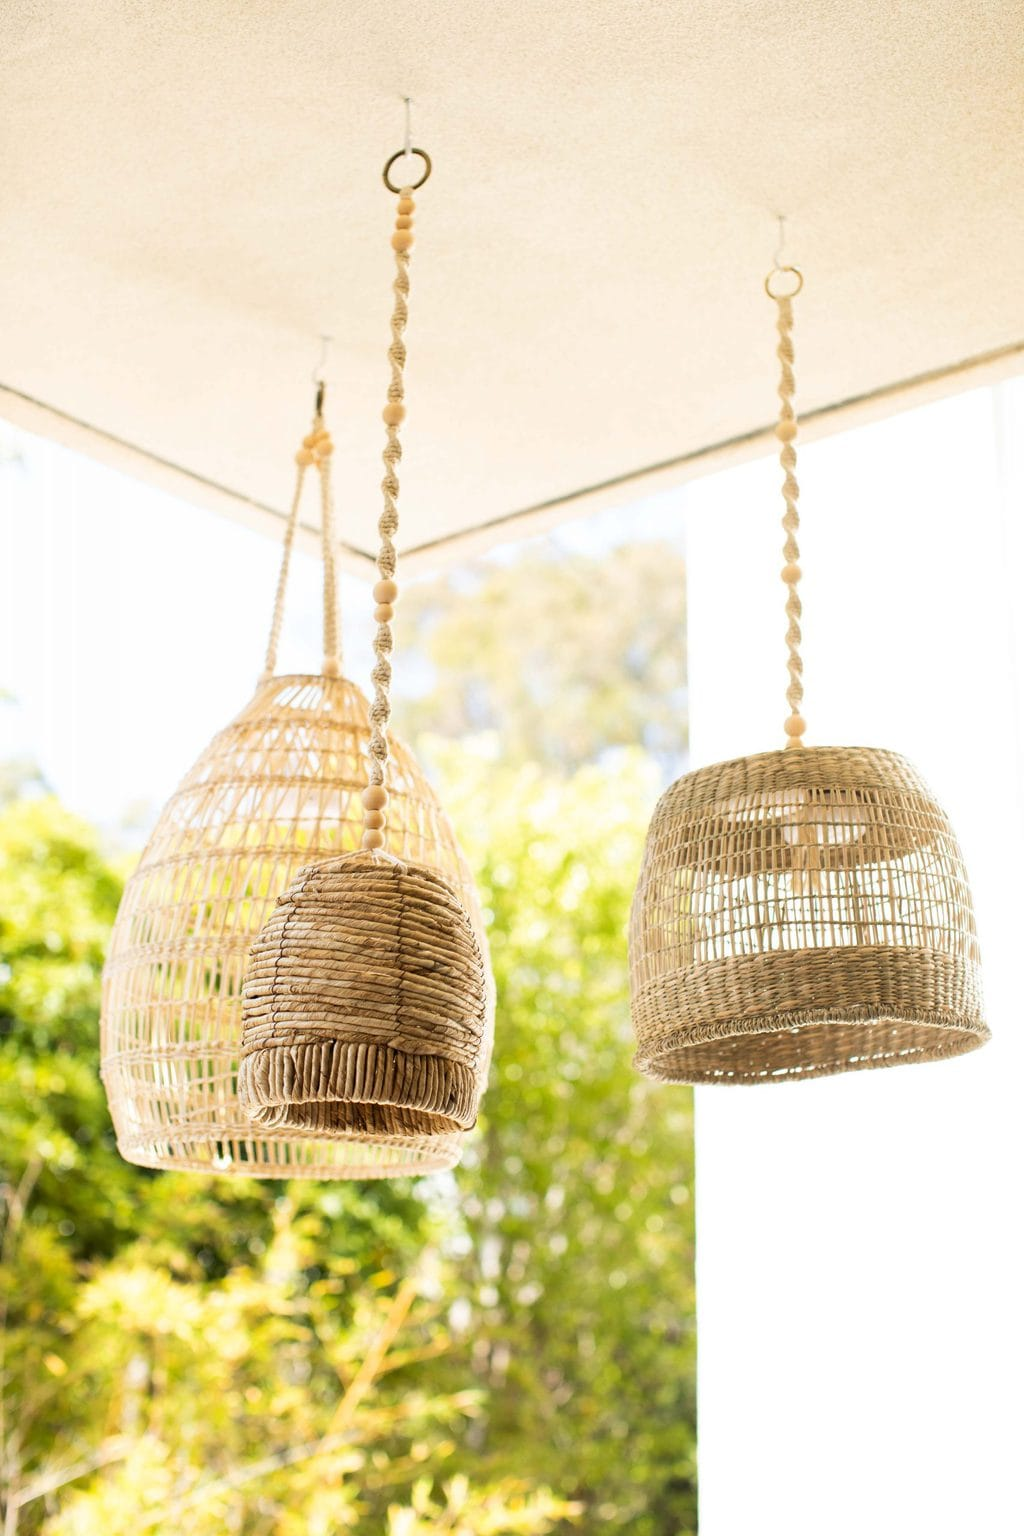 DIY Wireless Basket Lanterns hanging from an eye hook in the ceiling.